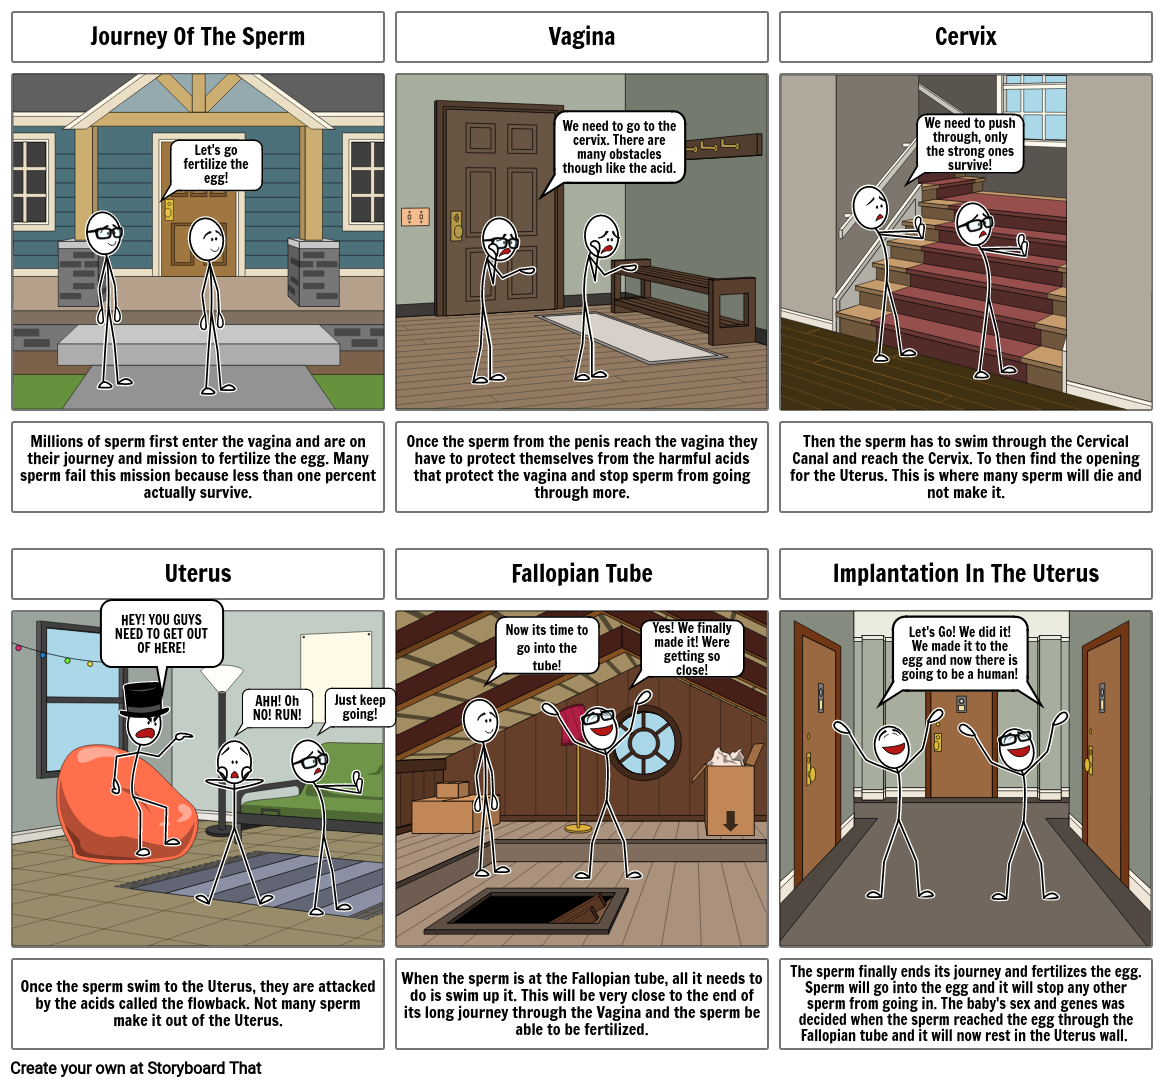 Journey of the Sperm Storyboard